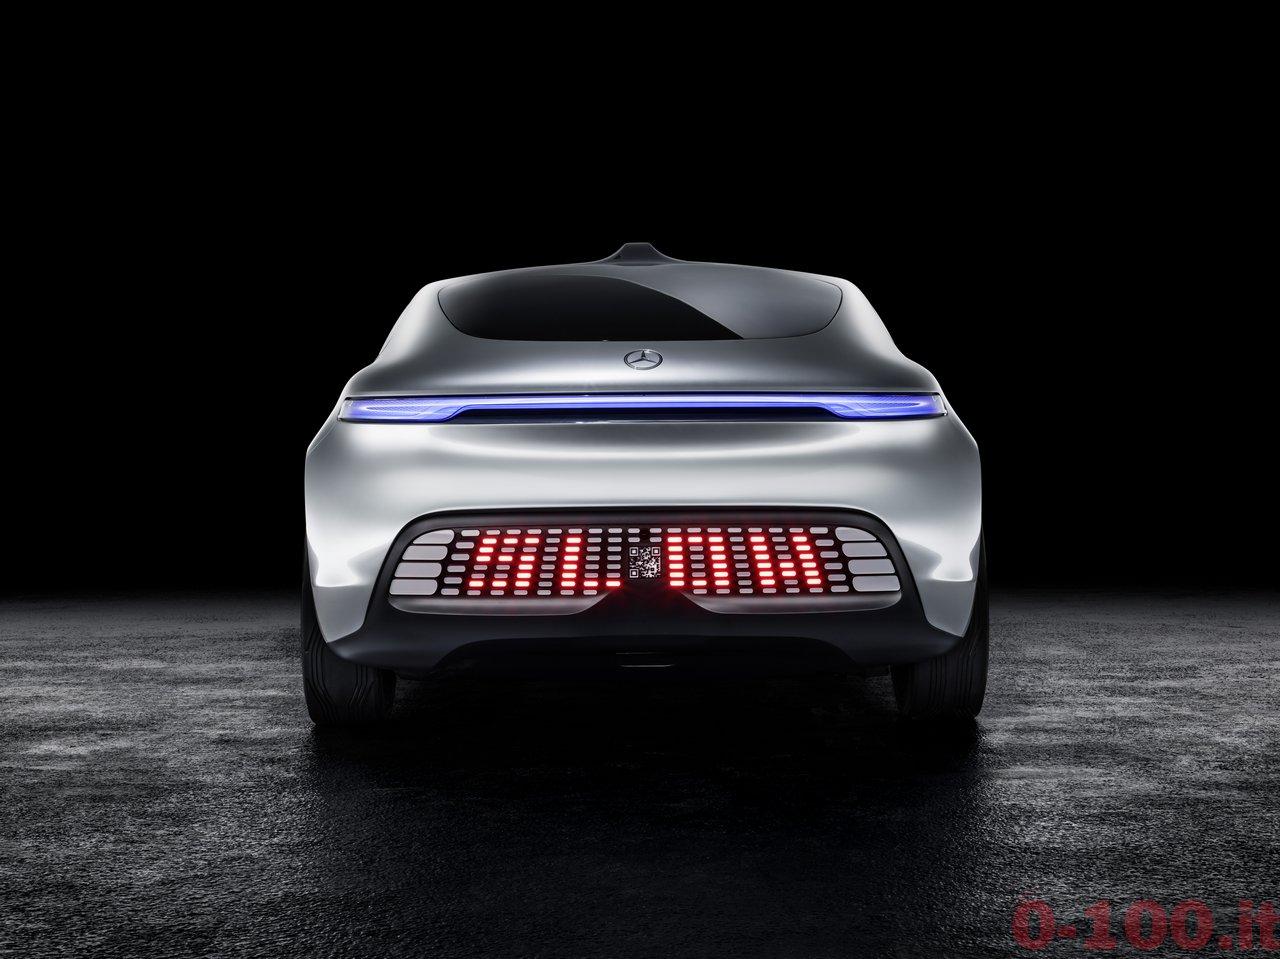 Mercedes-Benz F015 - Luxury in Motion